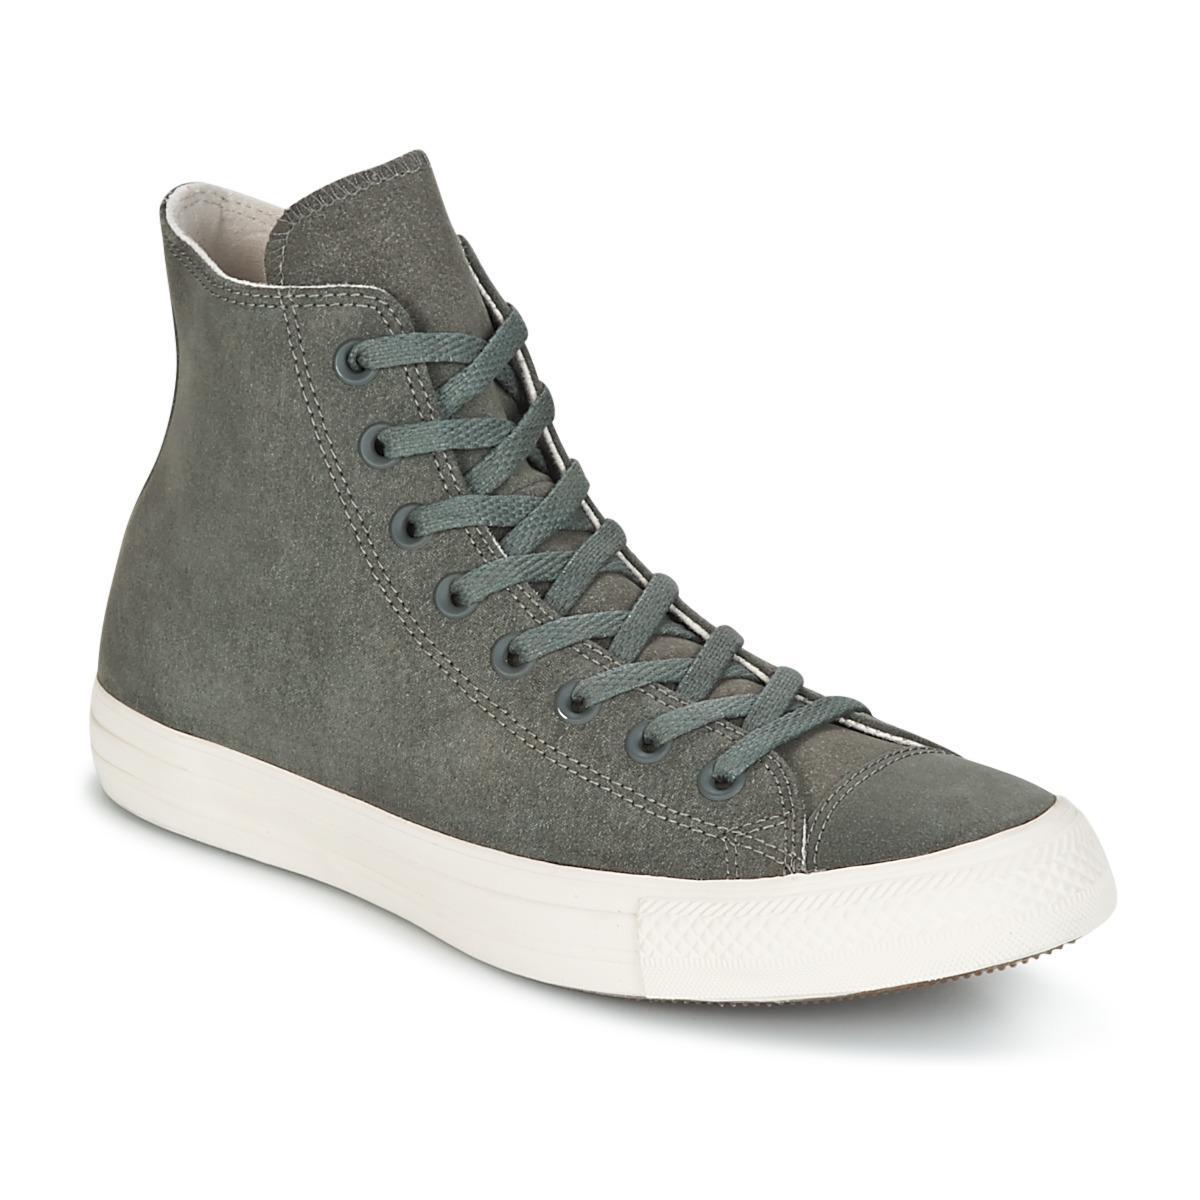 f8f4aa580dbff1 Converse. Gray Chuck Taylor All Star Hi Nubuck Men s Shoes (high-top  Trainers) ...